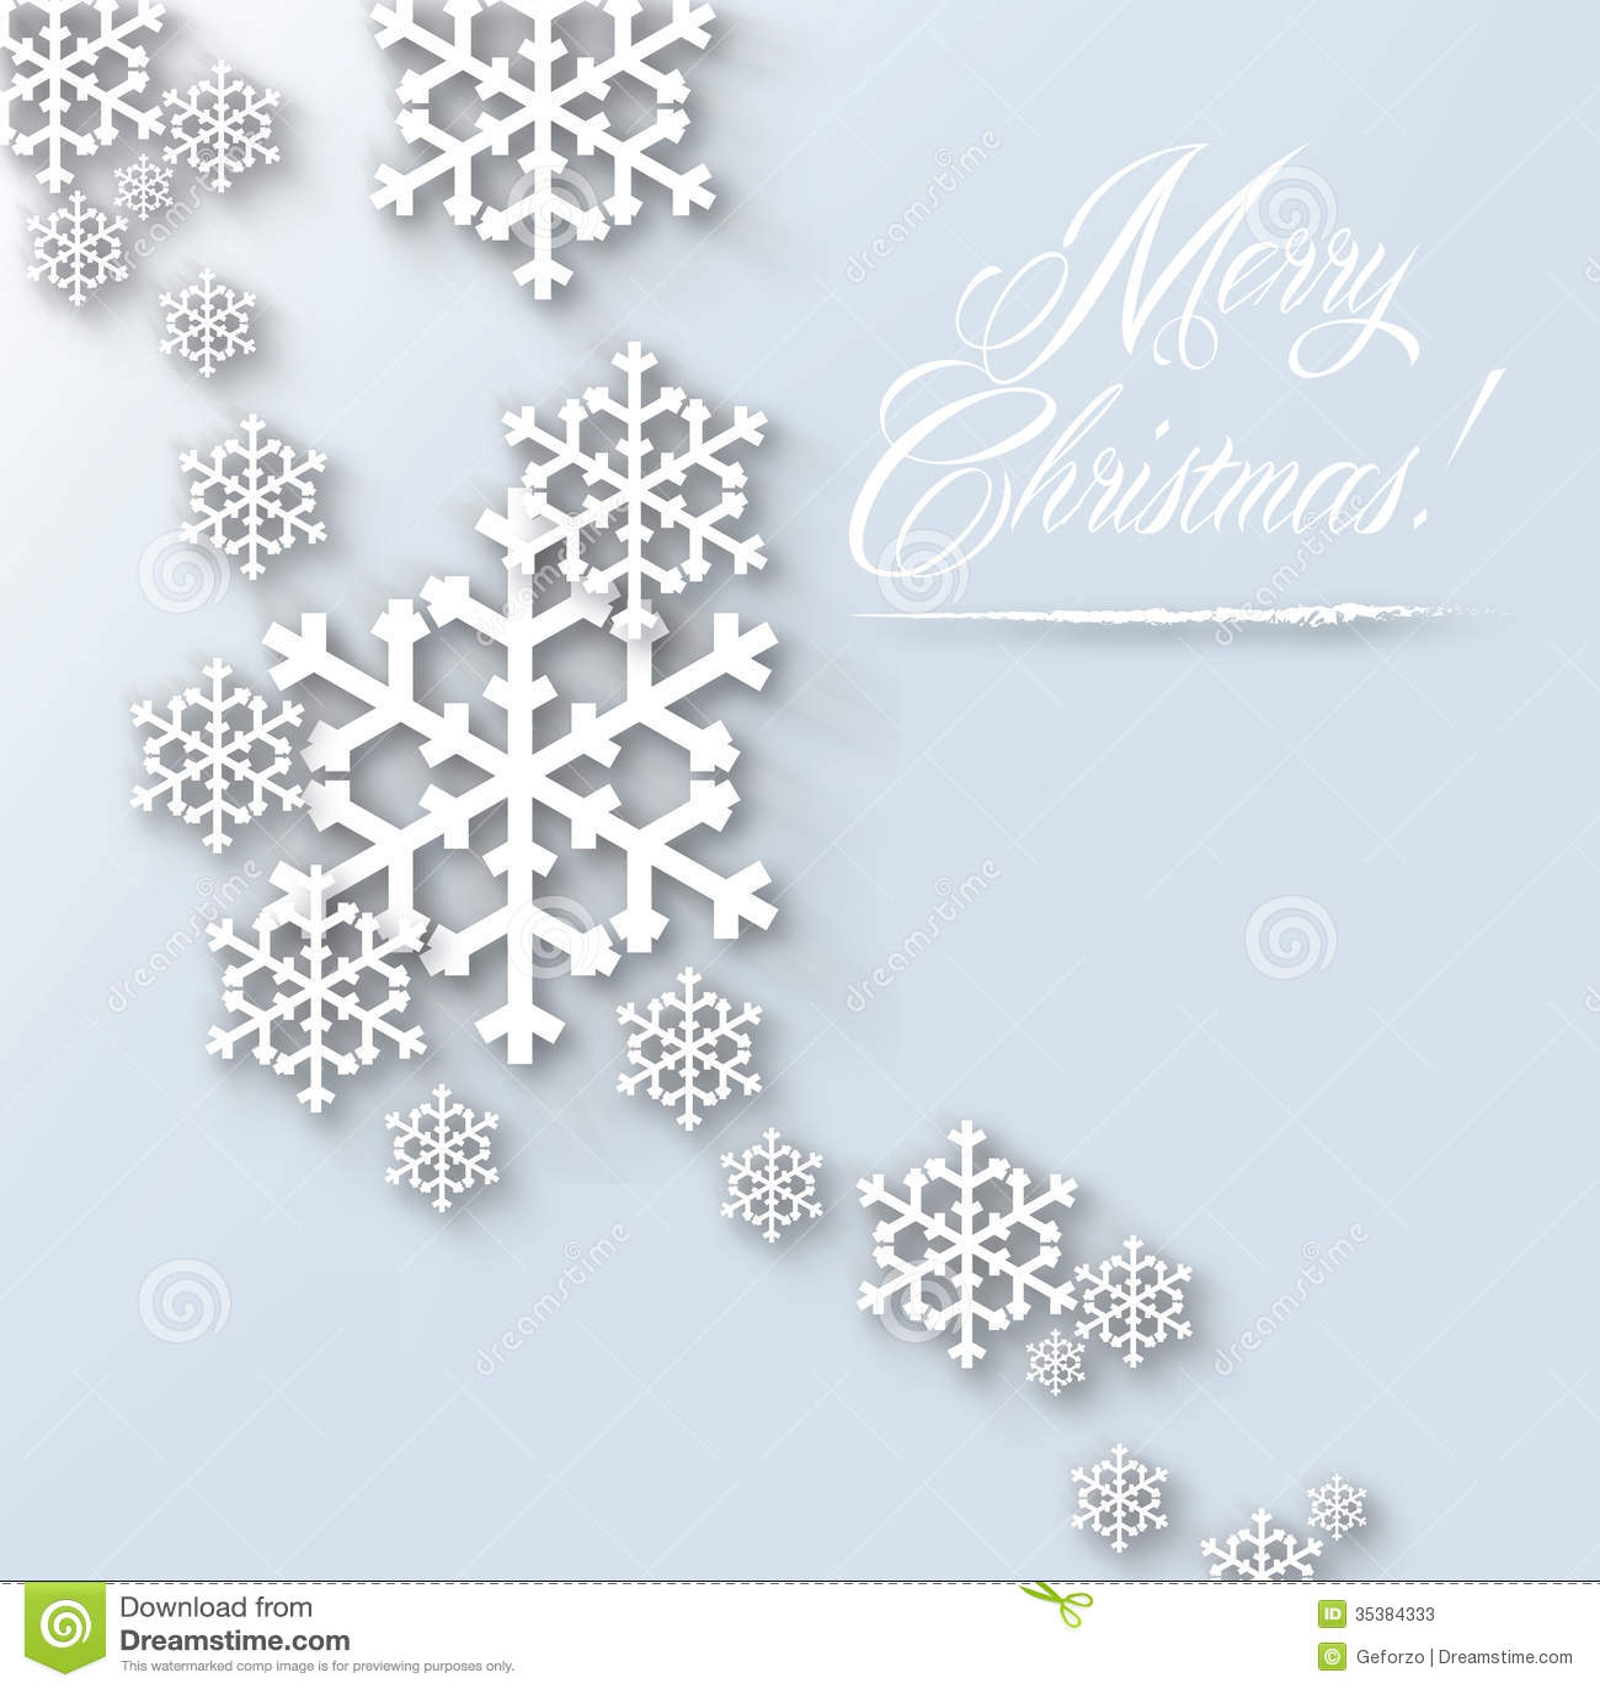 Merry Christmas Card - Light Stock Illustration - Illustration of ...